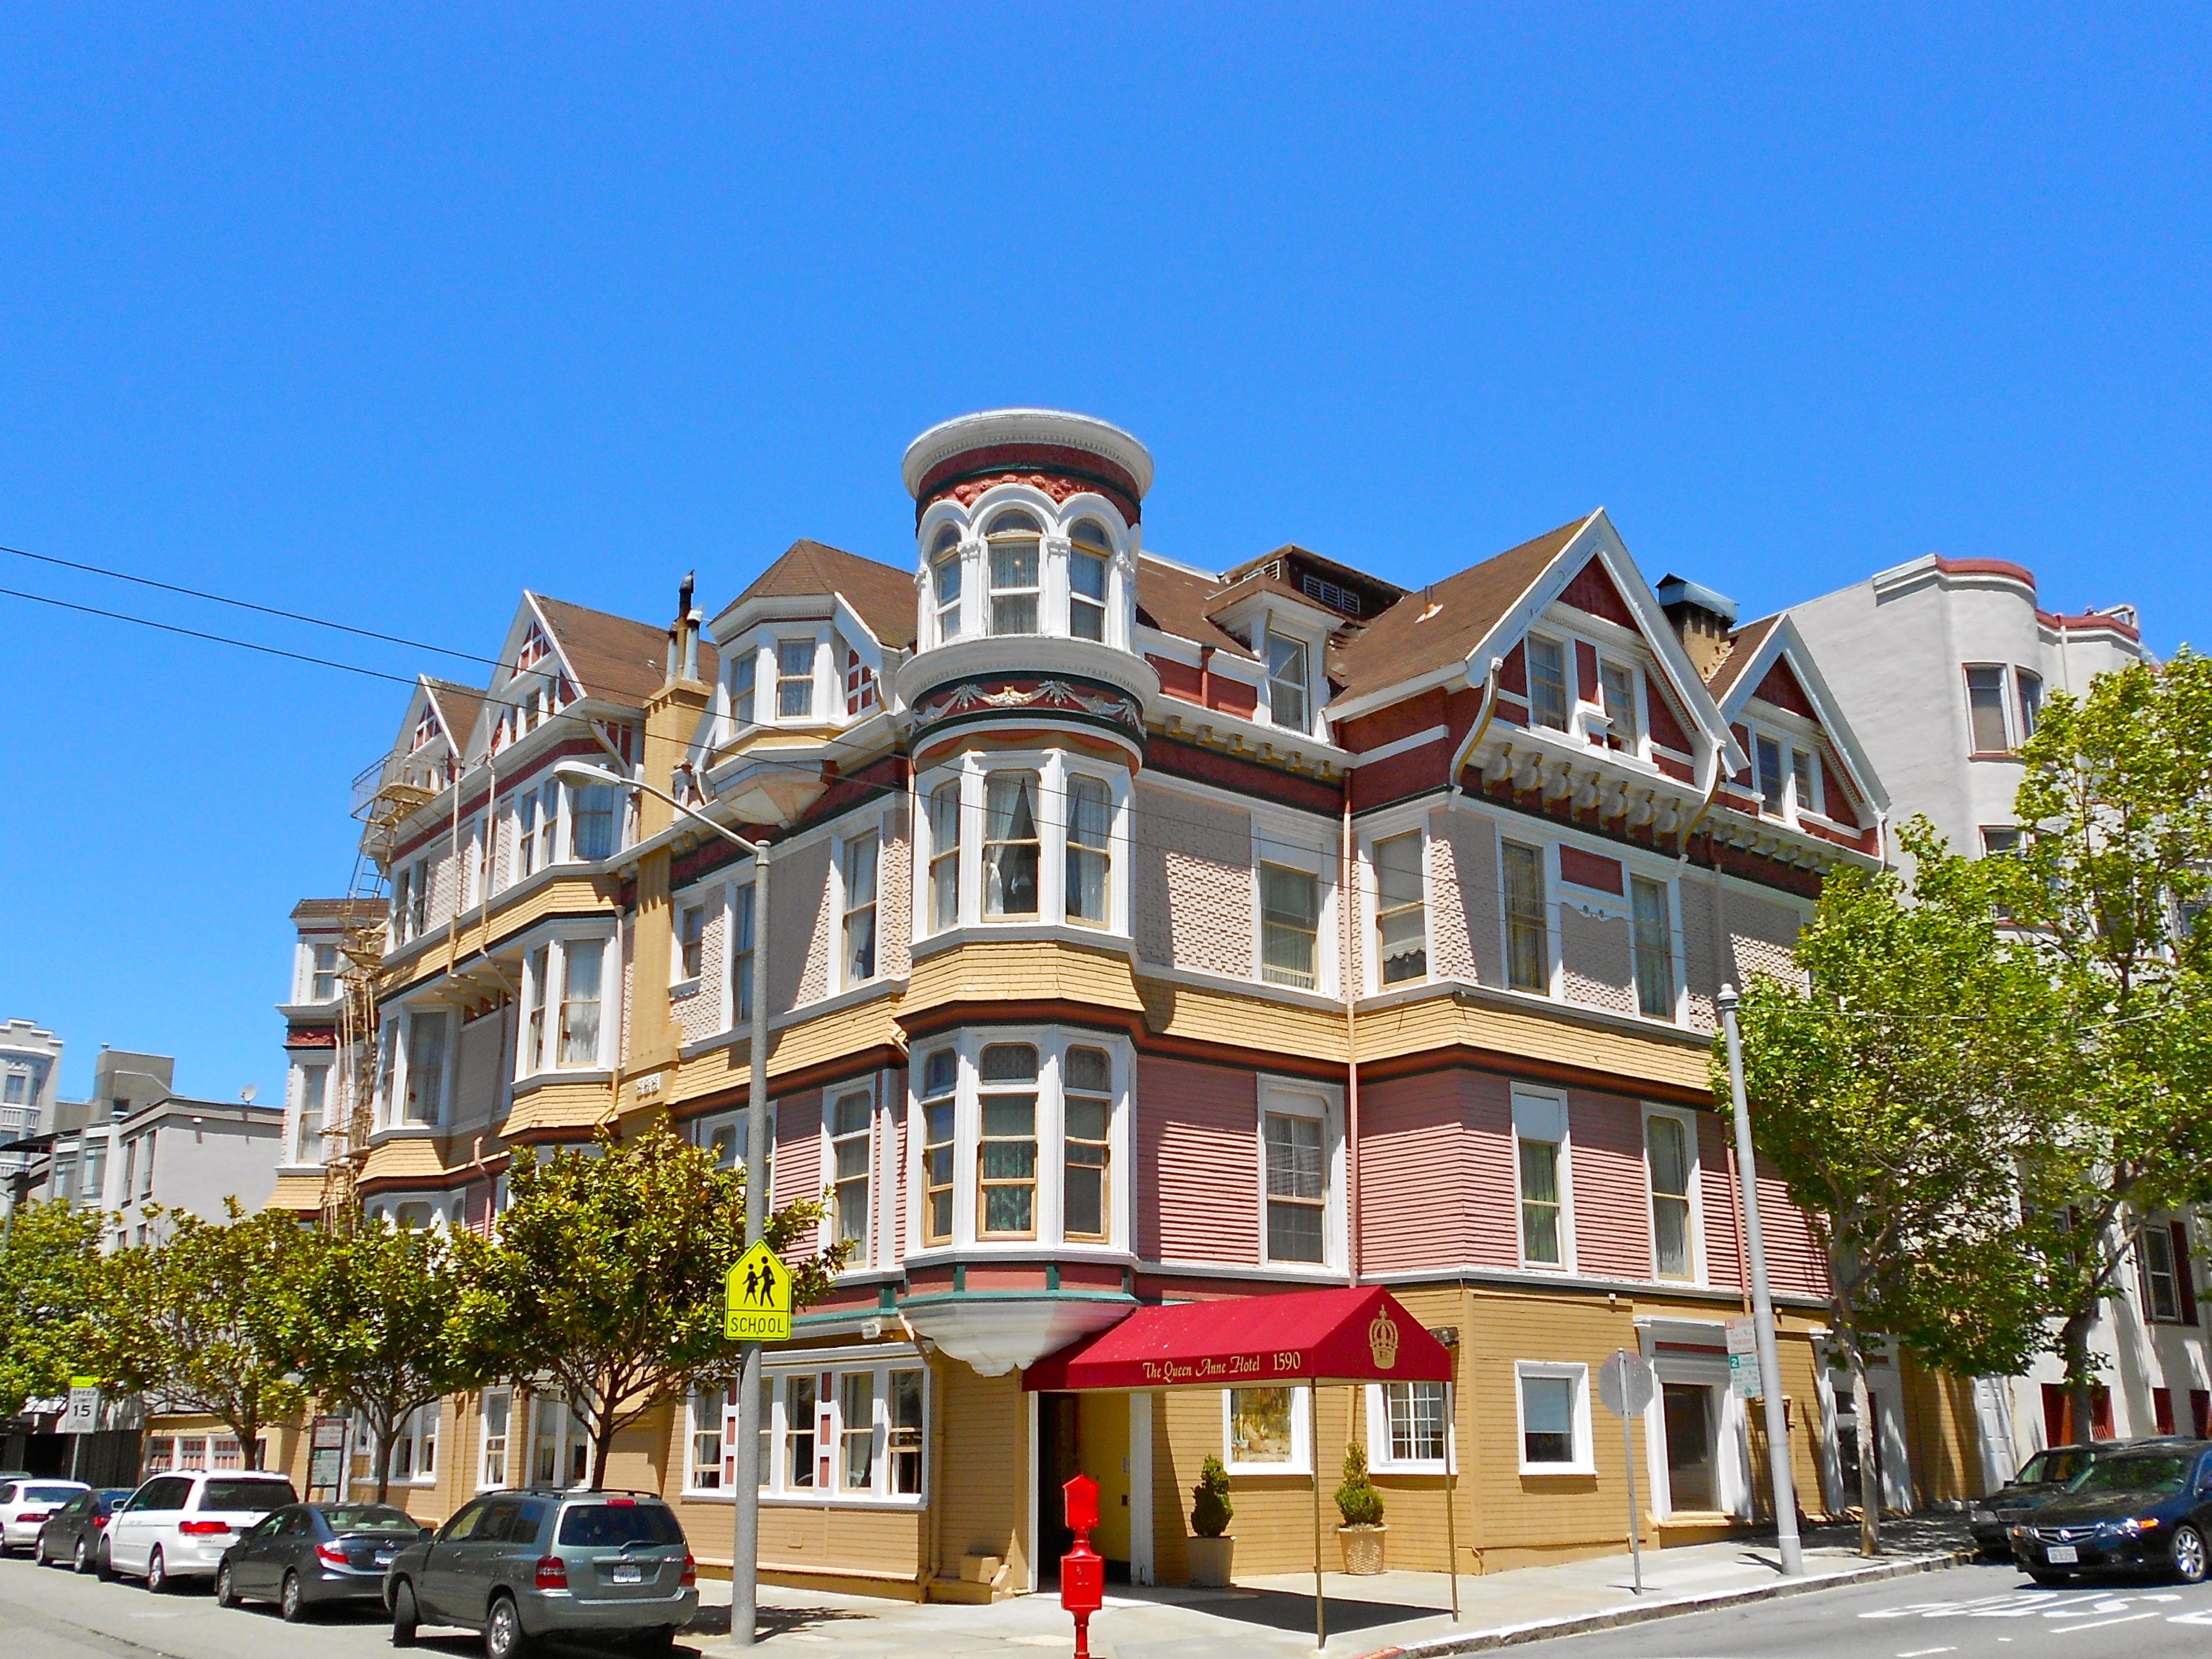 Sutter Hotel San Francisco